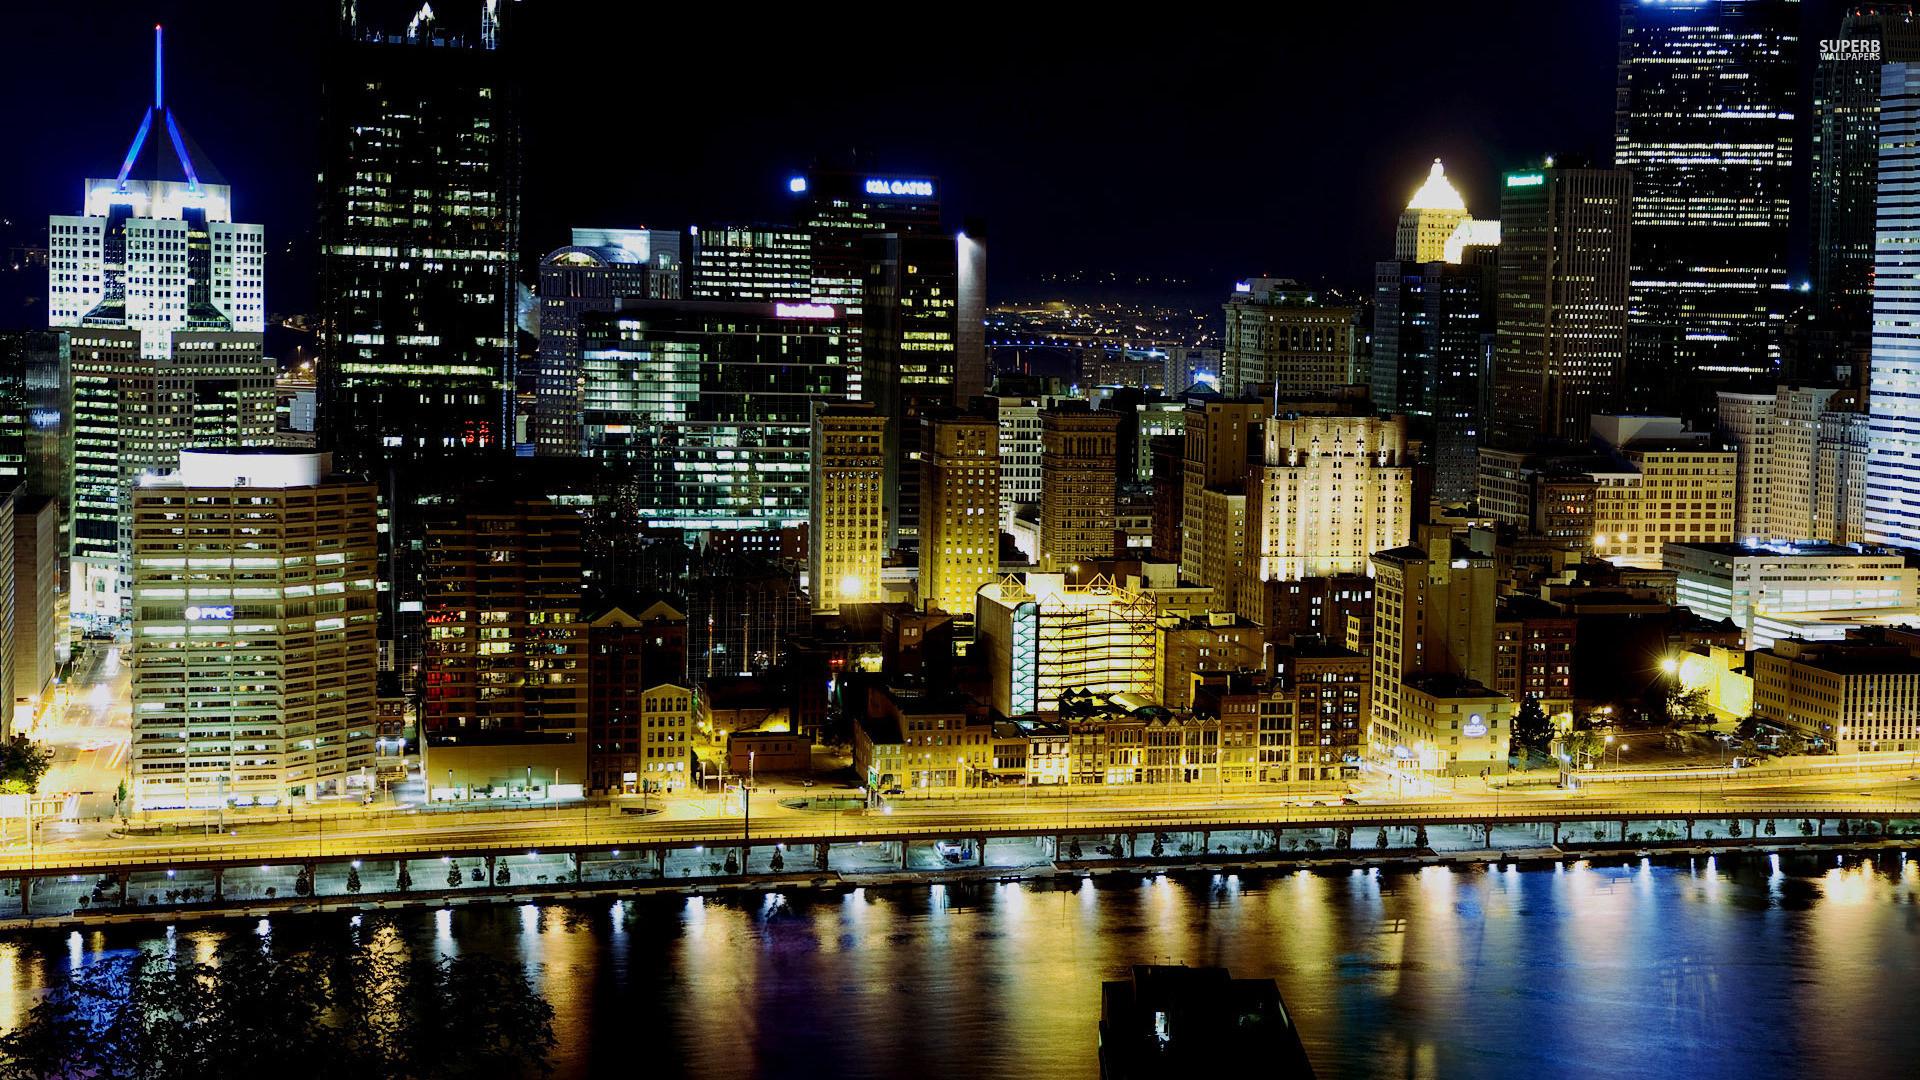 Pittsburgh Desktop Wallpaper Skyline: Steelers Screensavers And Wallpaper (69+ Images